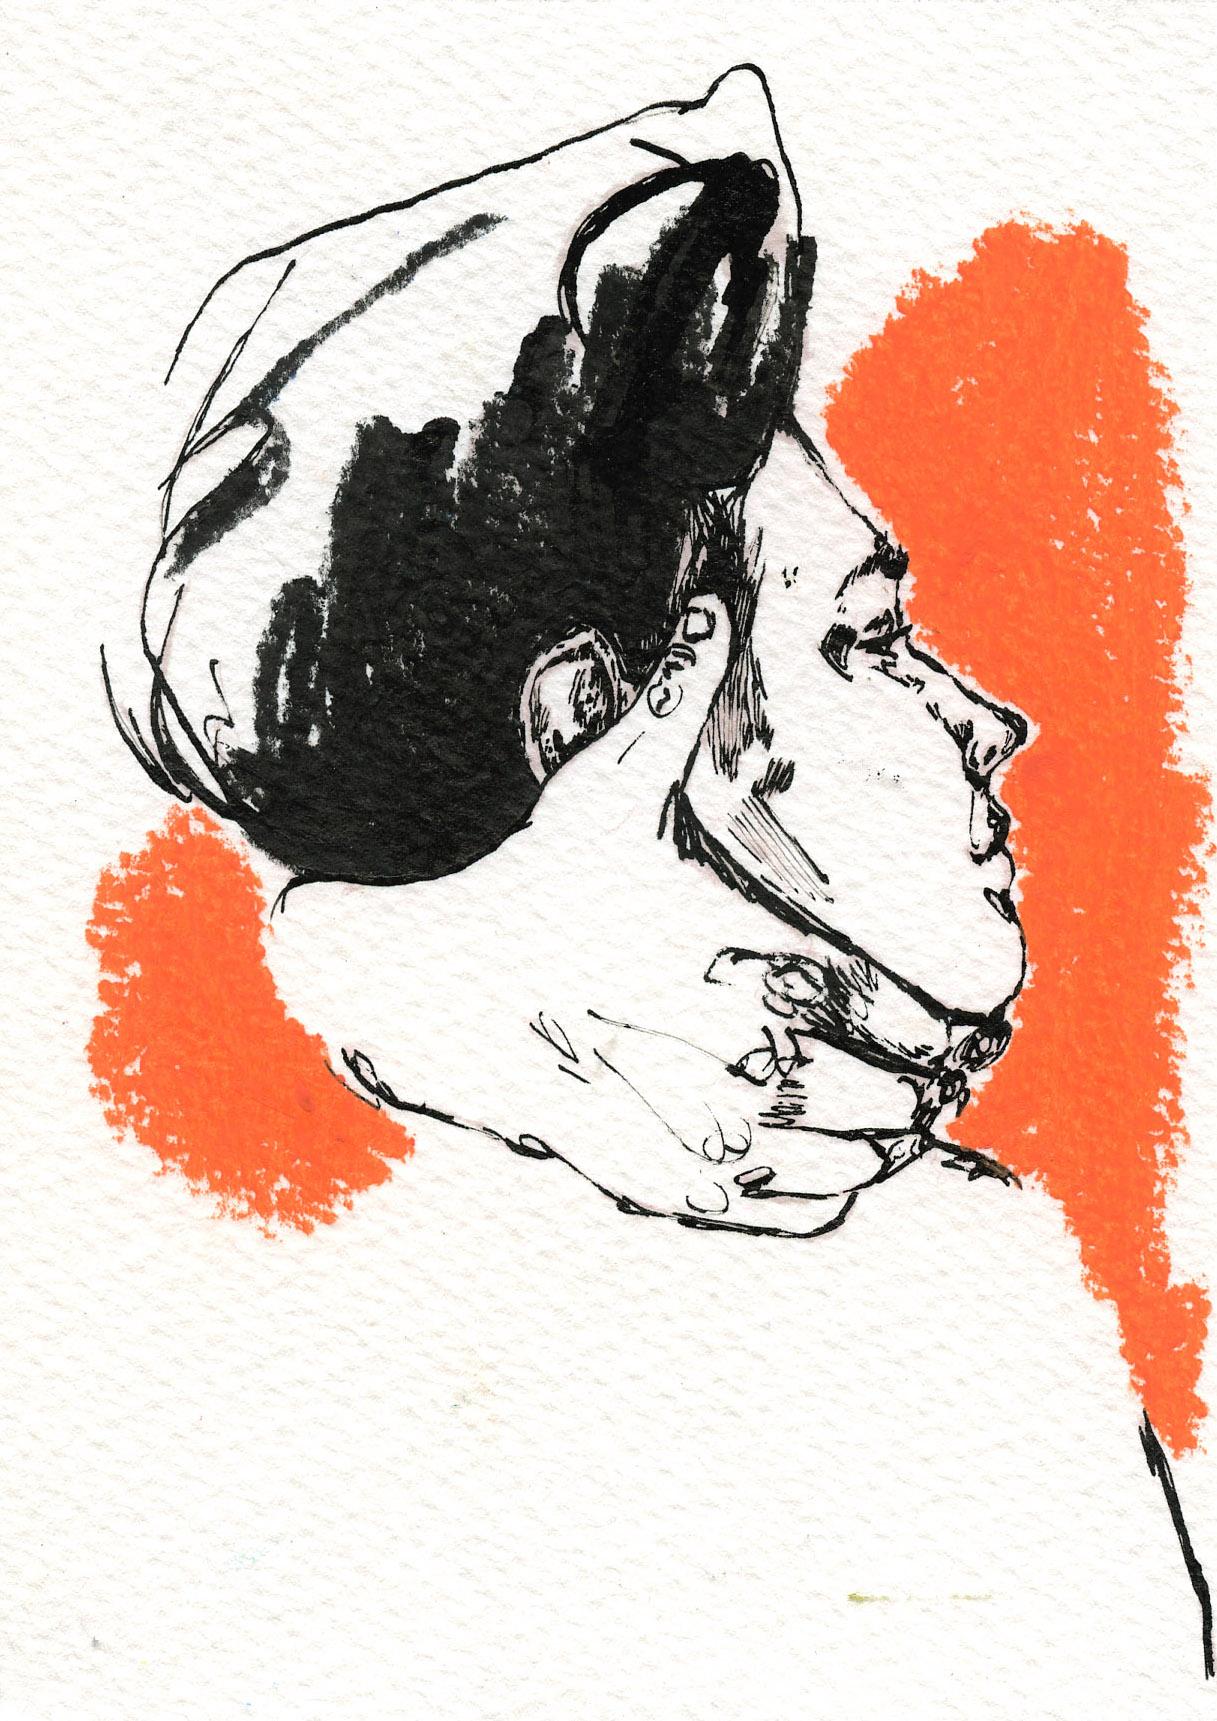 Marcelina Amelia - Heartbeats cropped edge.jpg